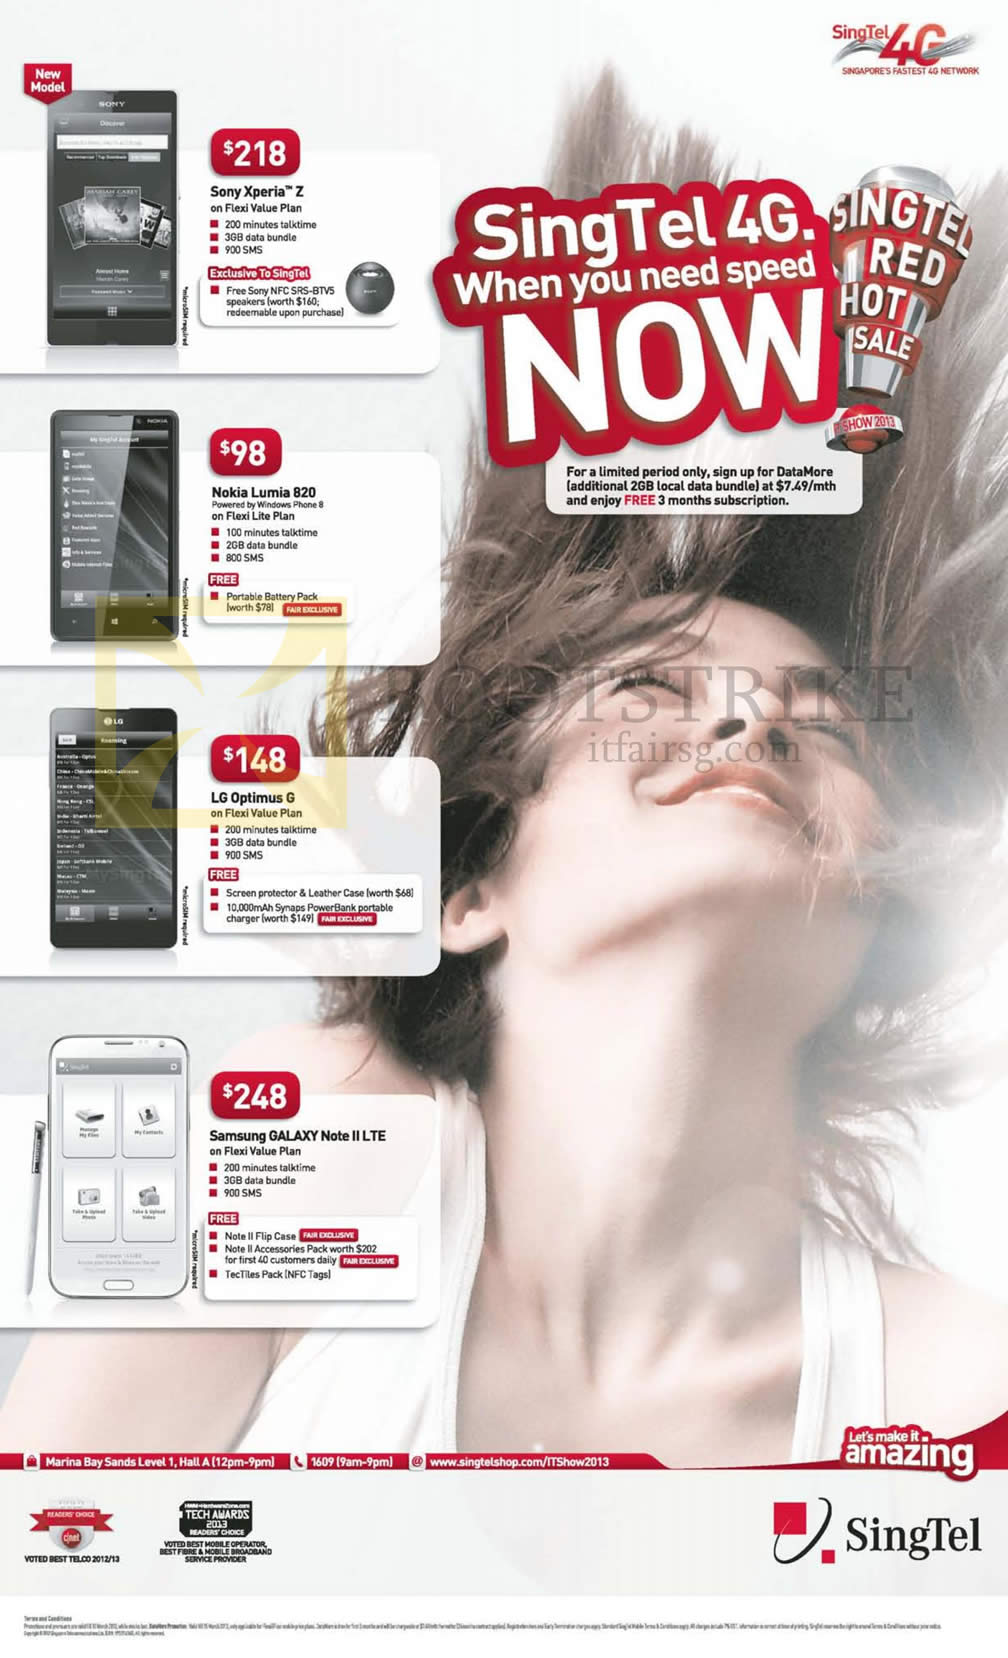 IT SHOW 2013 price list image brochure of Singtel Mobile Phones Sony Xperia Z, Nokia Lumia 820, LG Optimus G, Samsung Galaxy Note II LTE